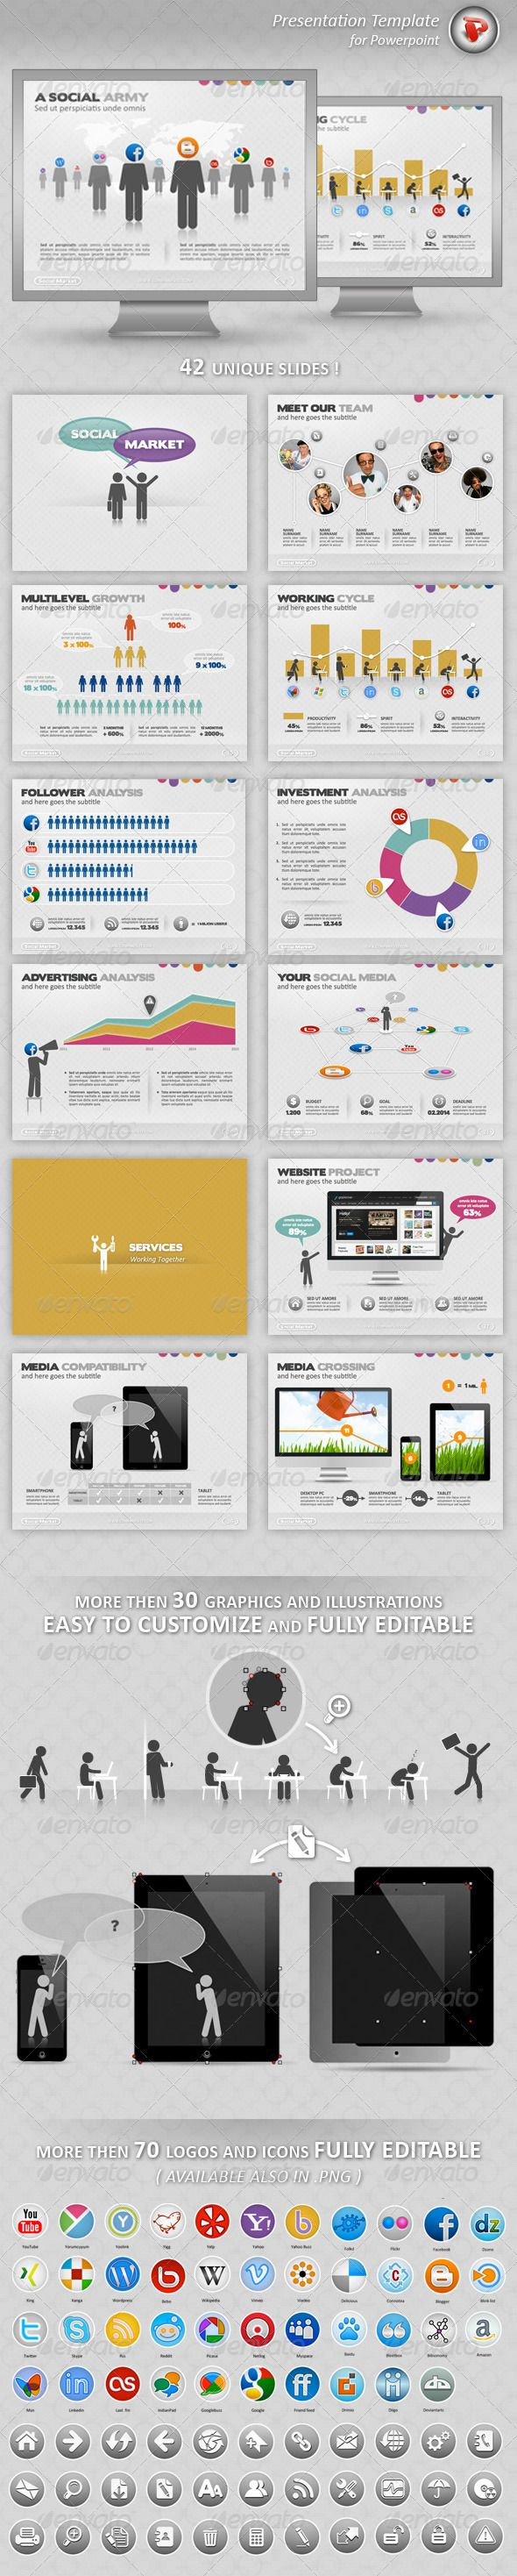 Social Market Powerpoint Presentation